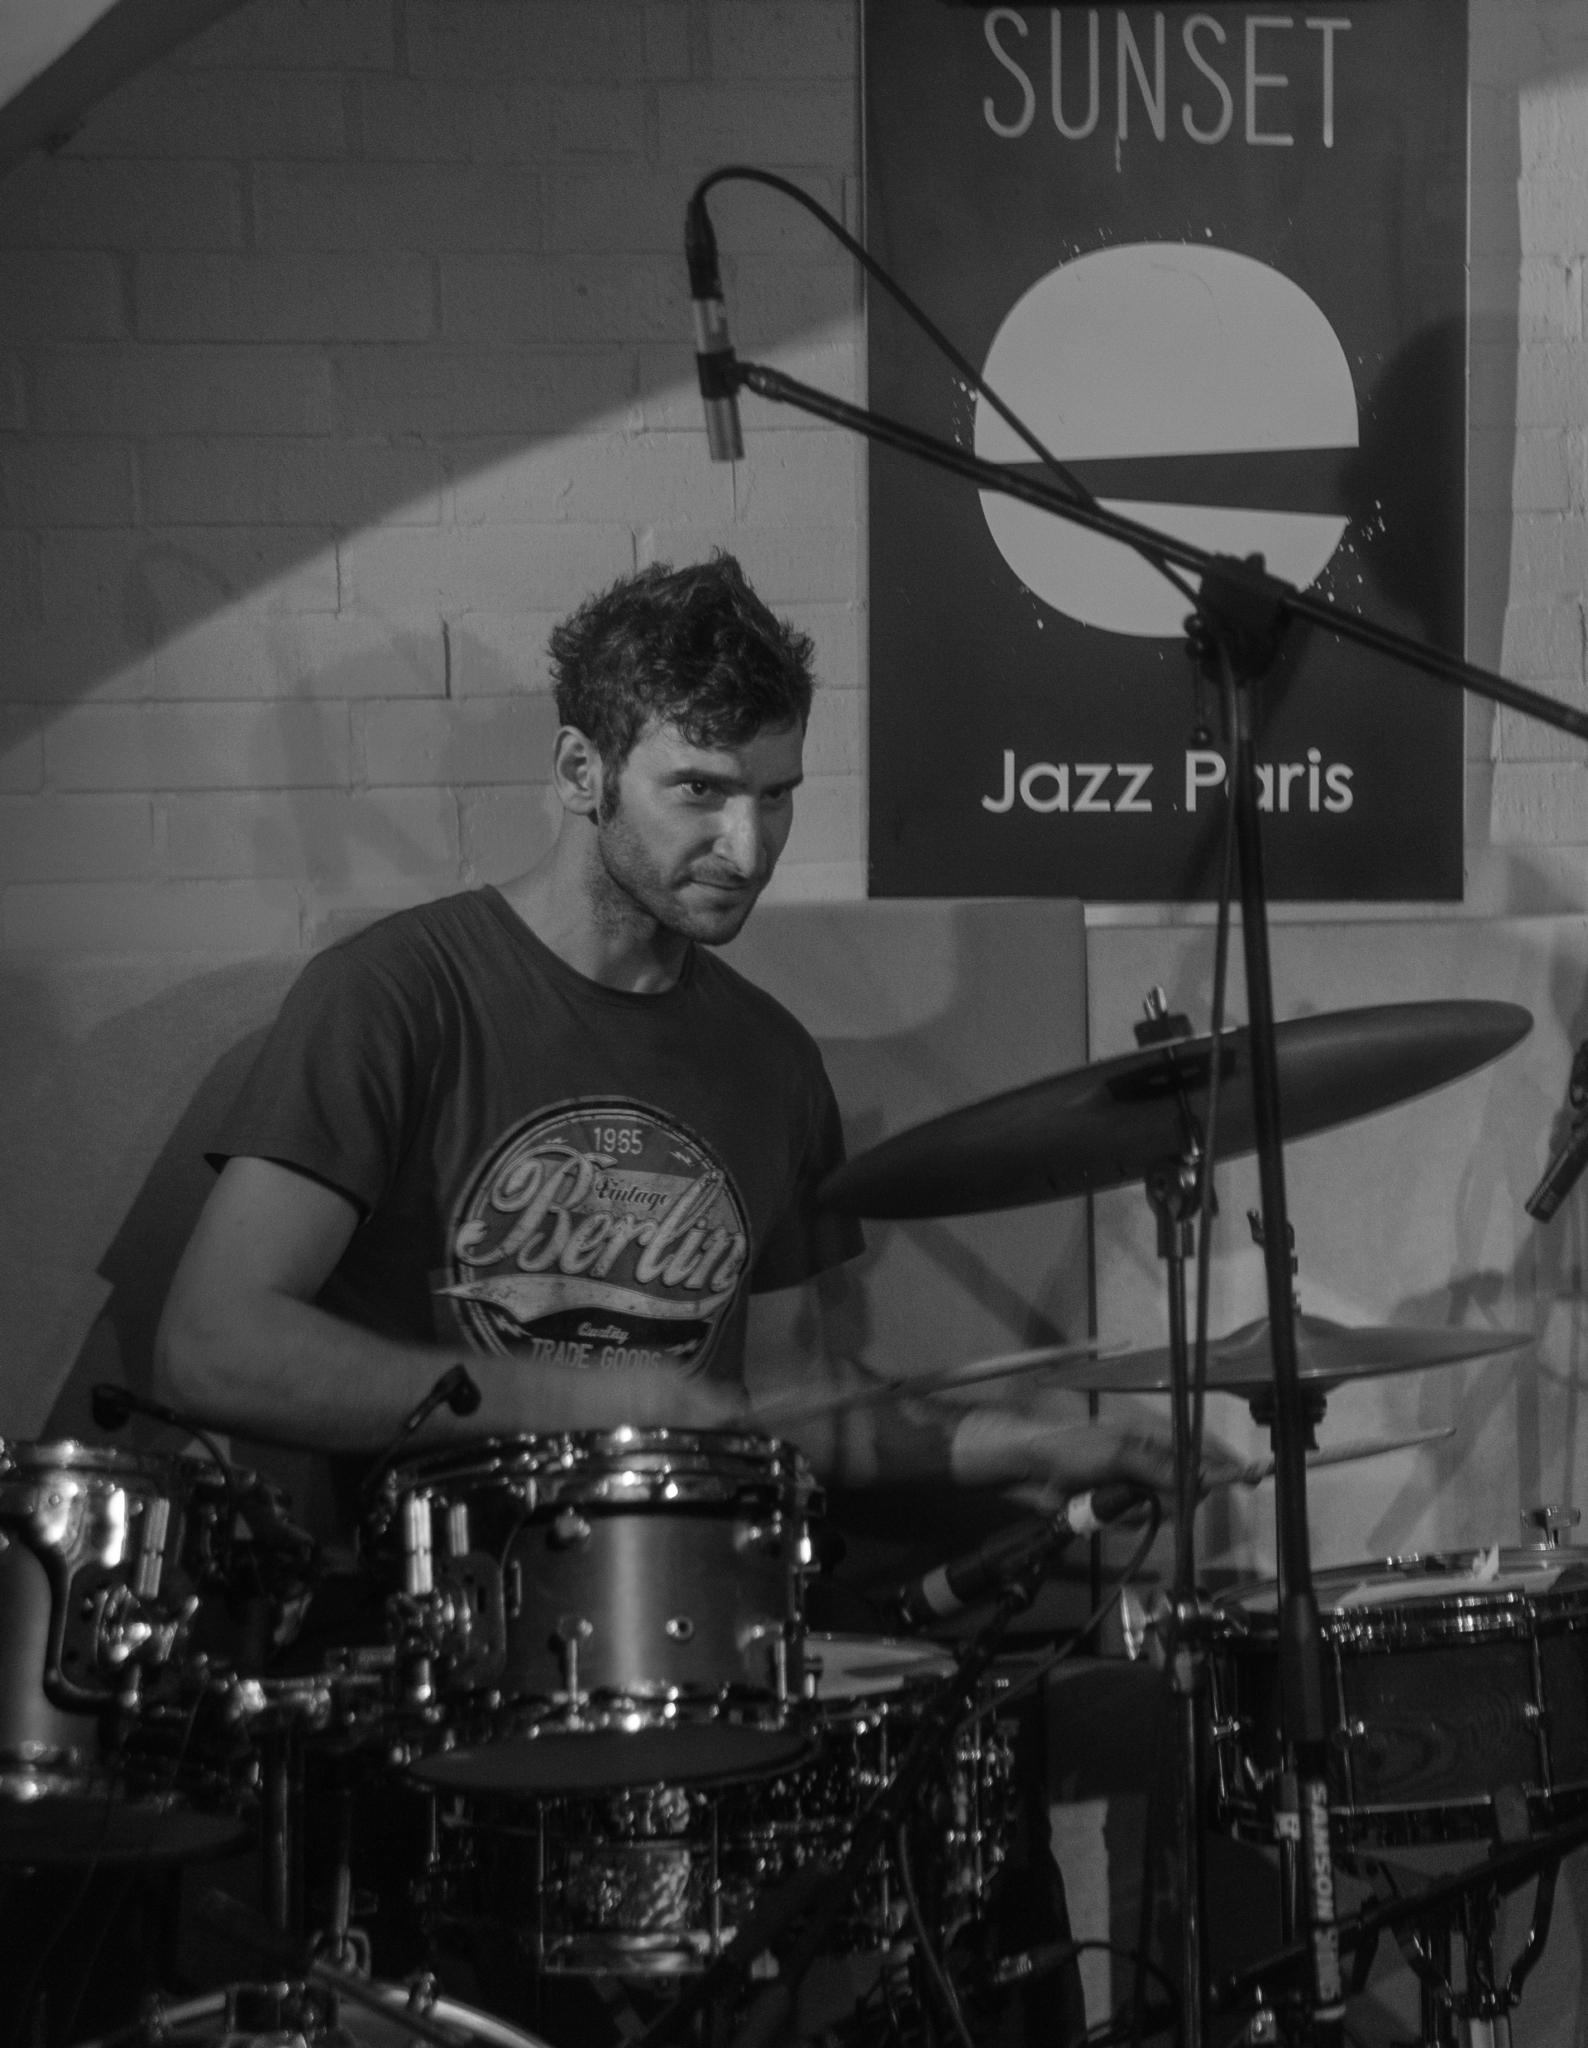 Jazz Rock Progressif - 4dB - concert Sunset